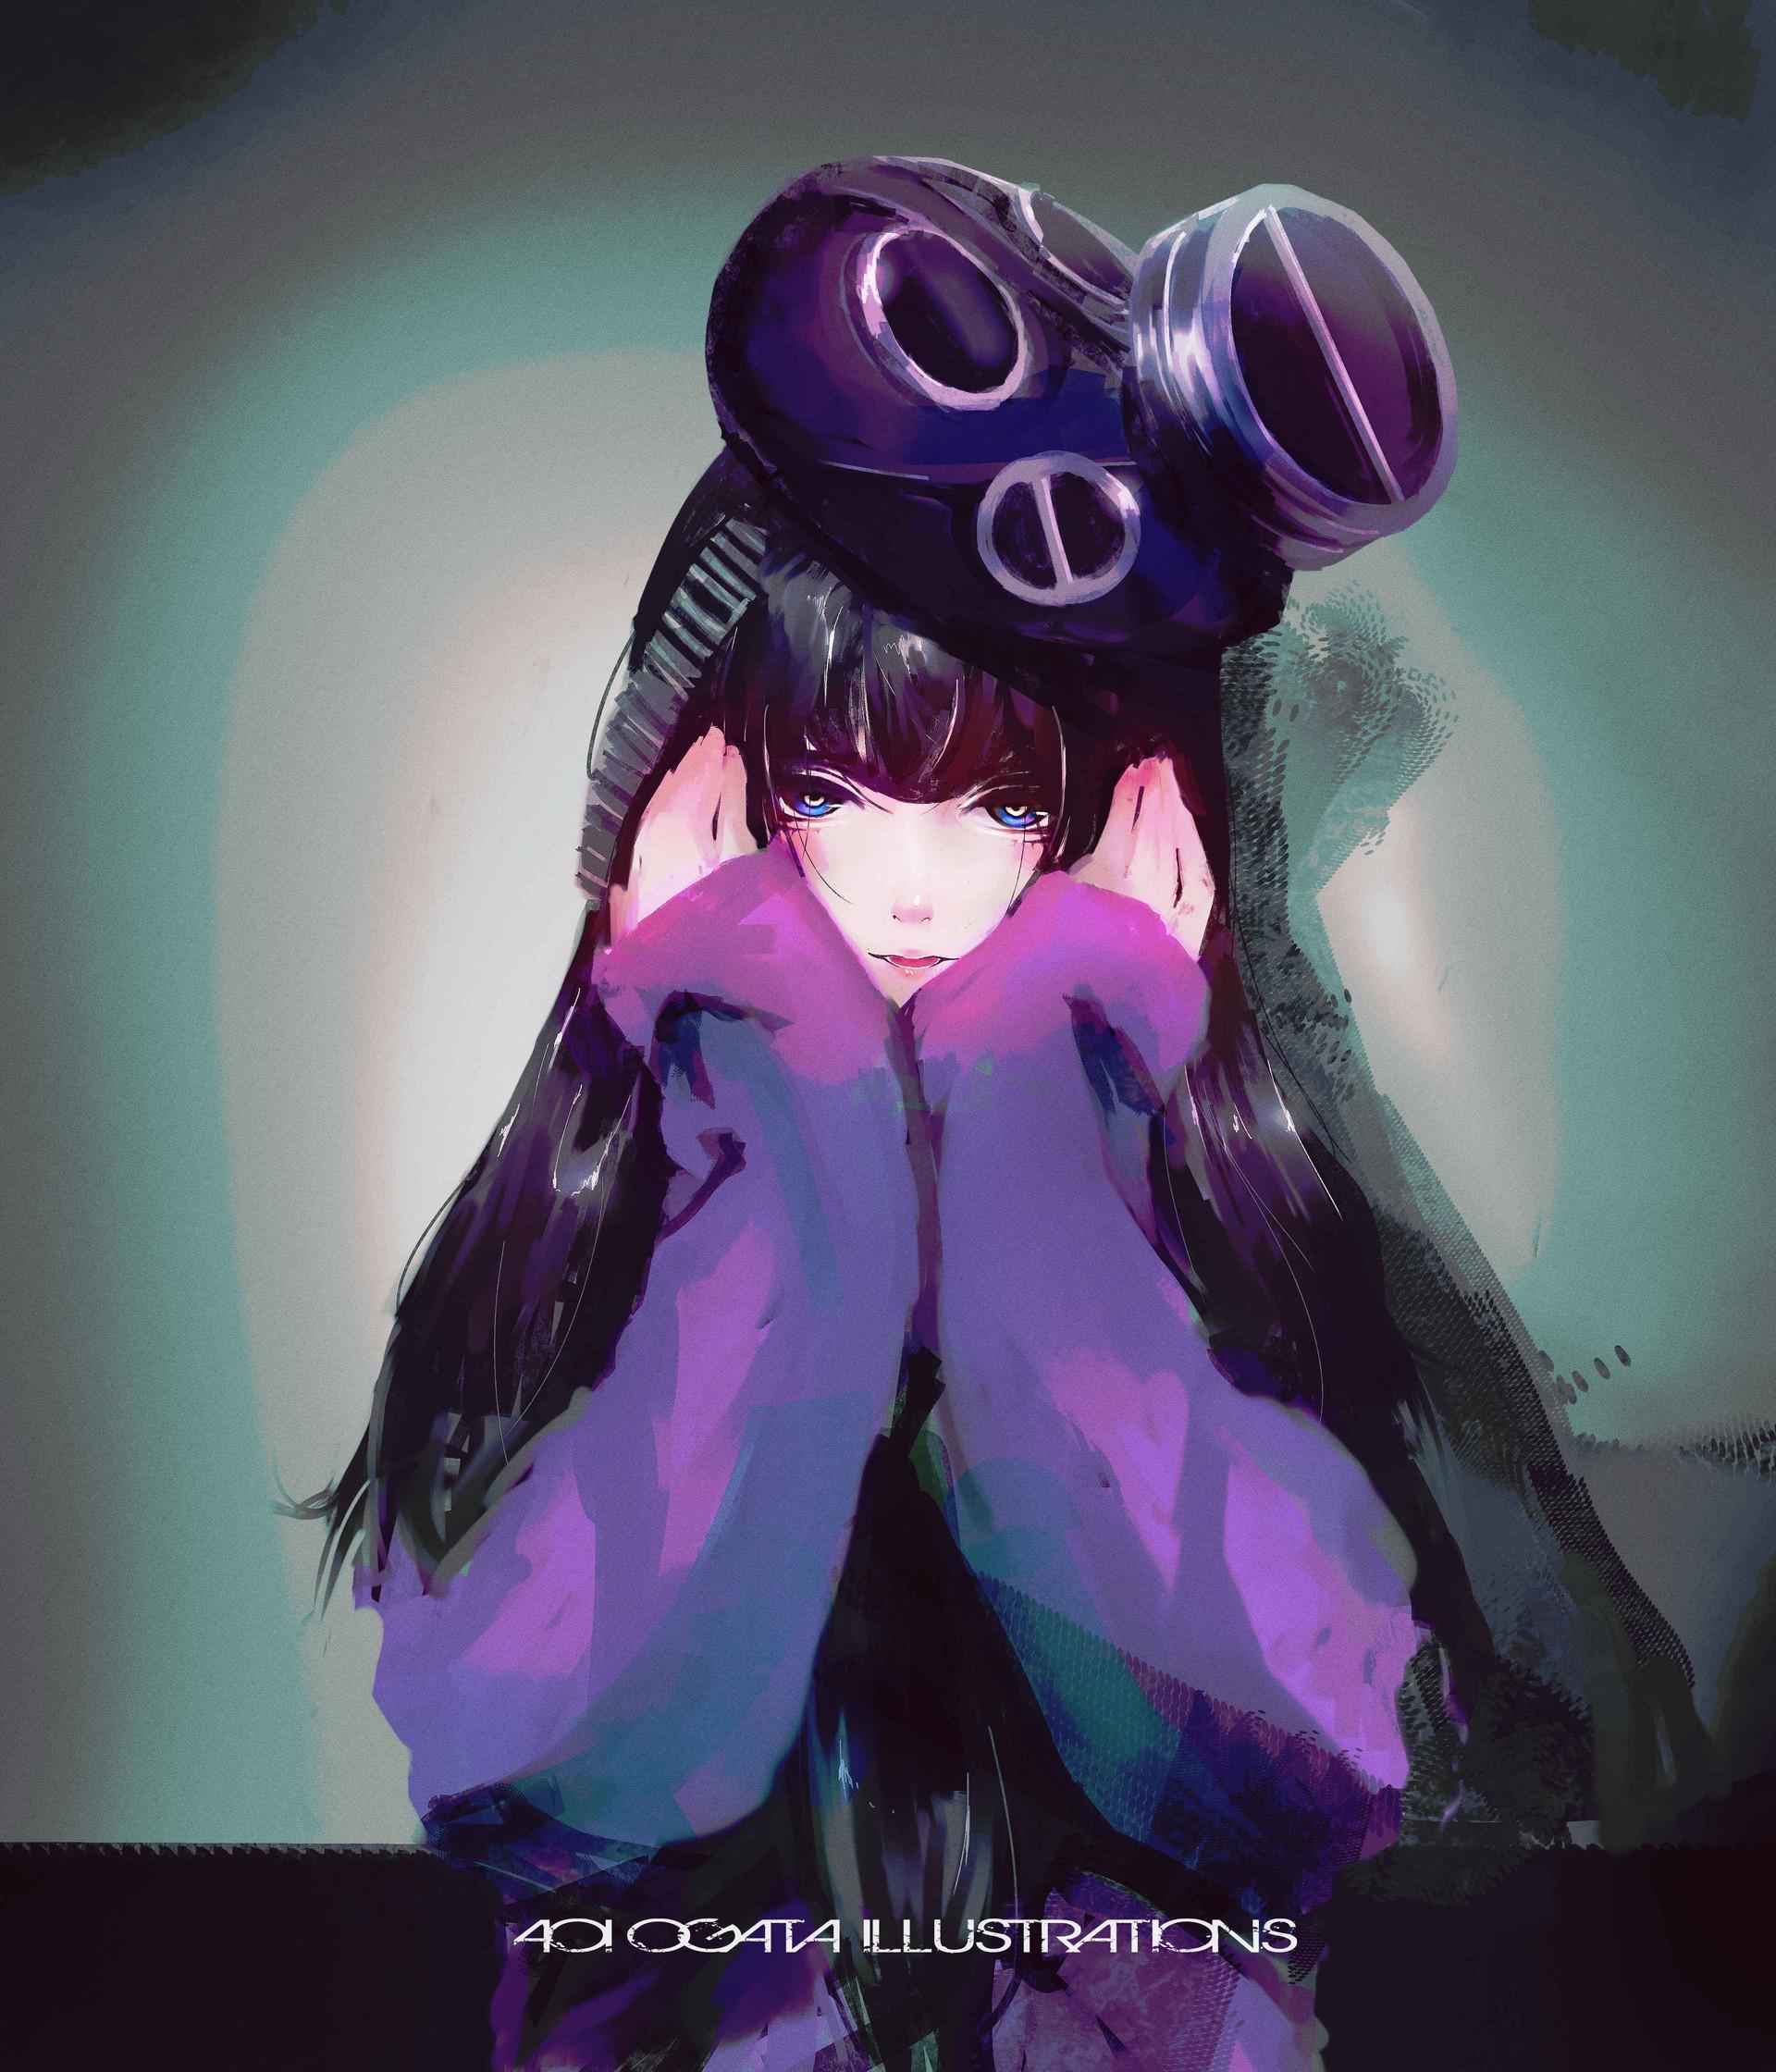 Aoi ogata sdggf